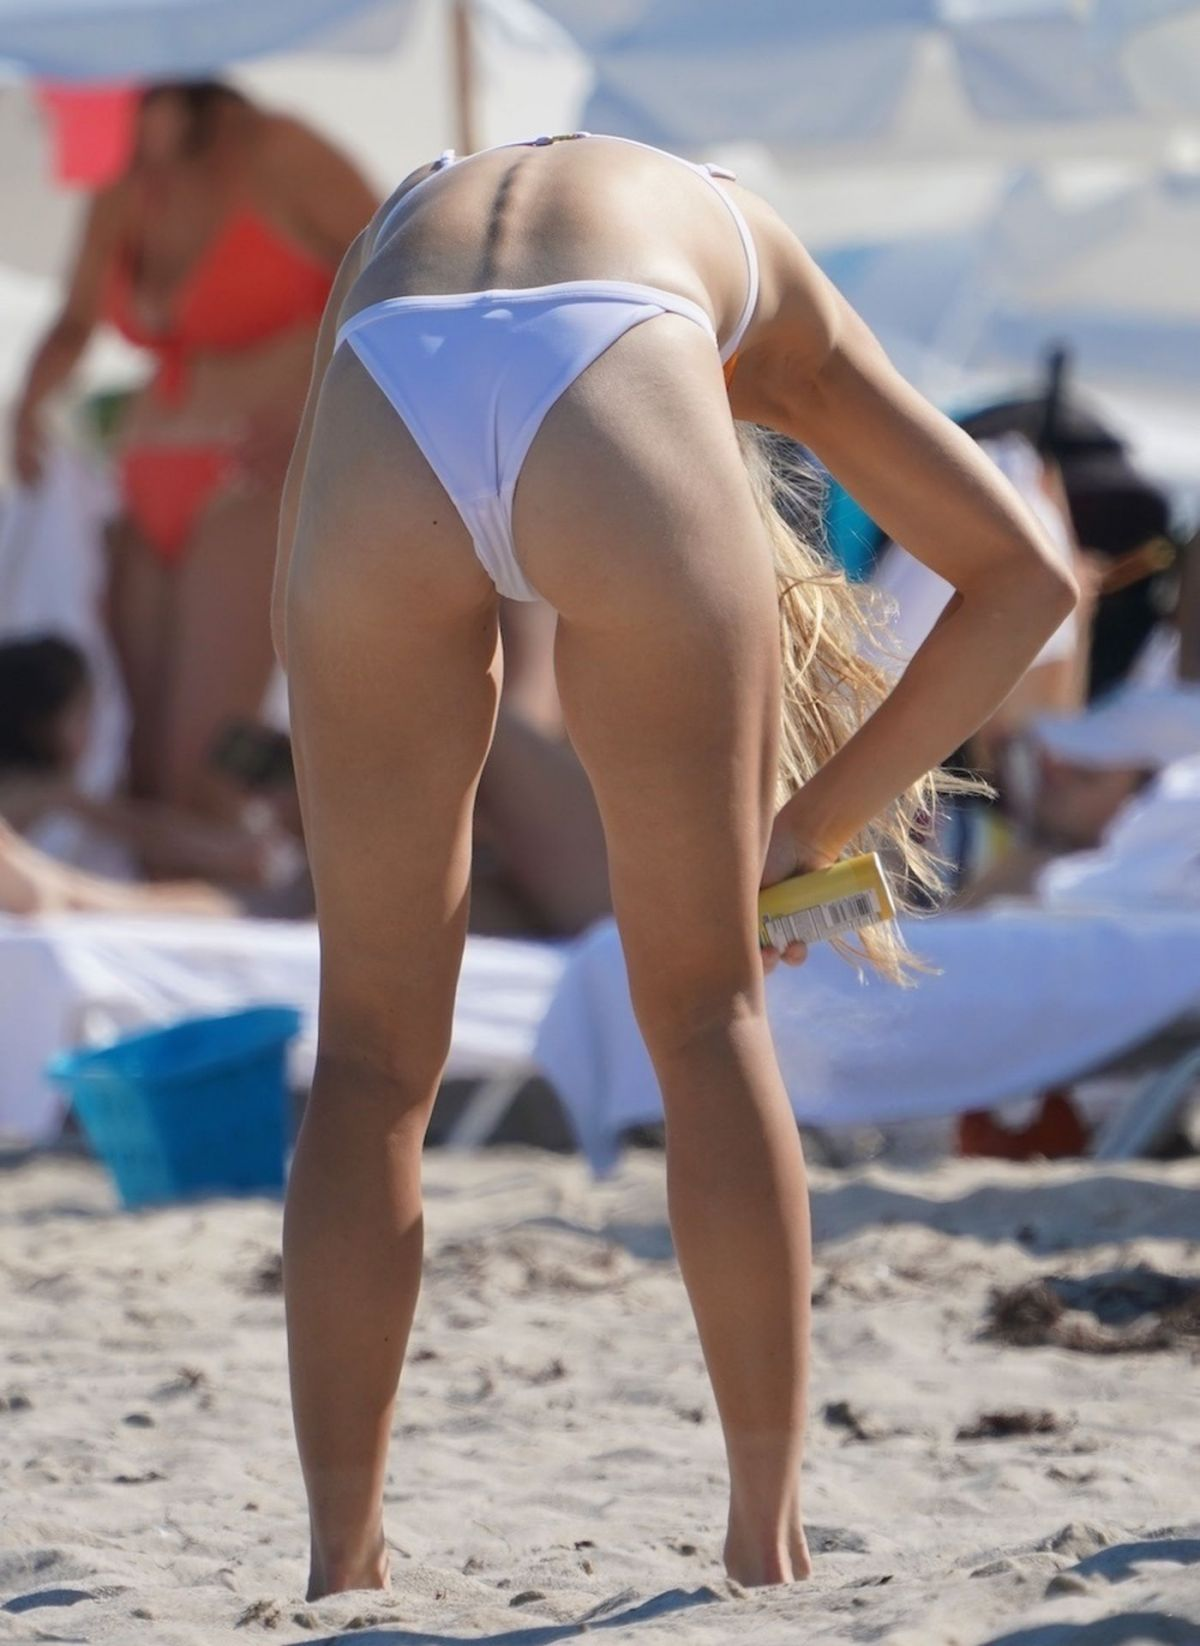 Accidental Bikini Slip